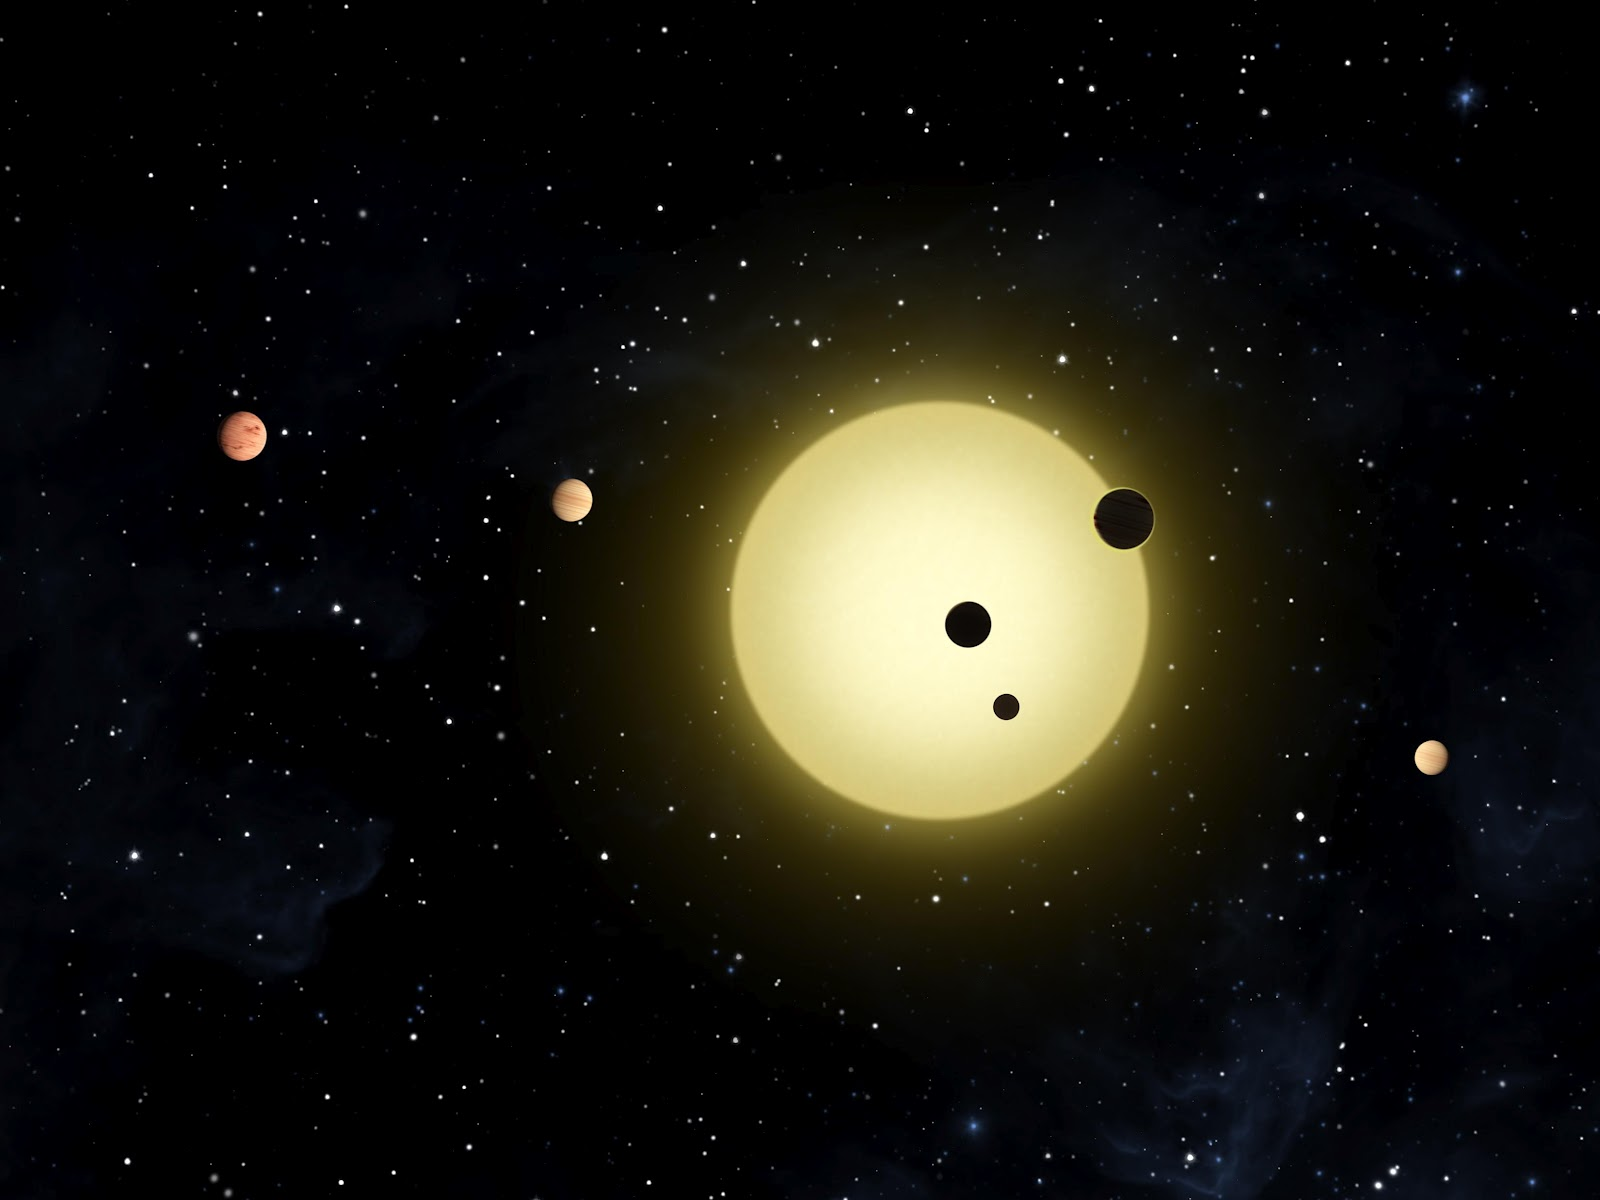 Kepler Planets wallpaper background